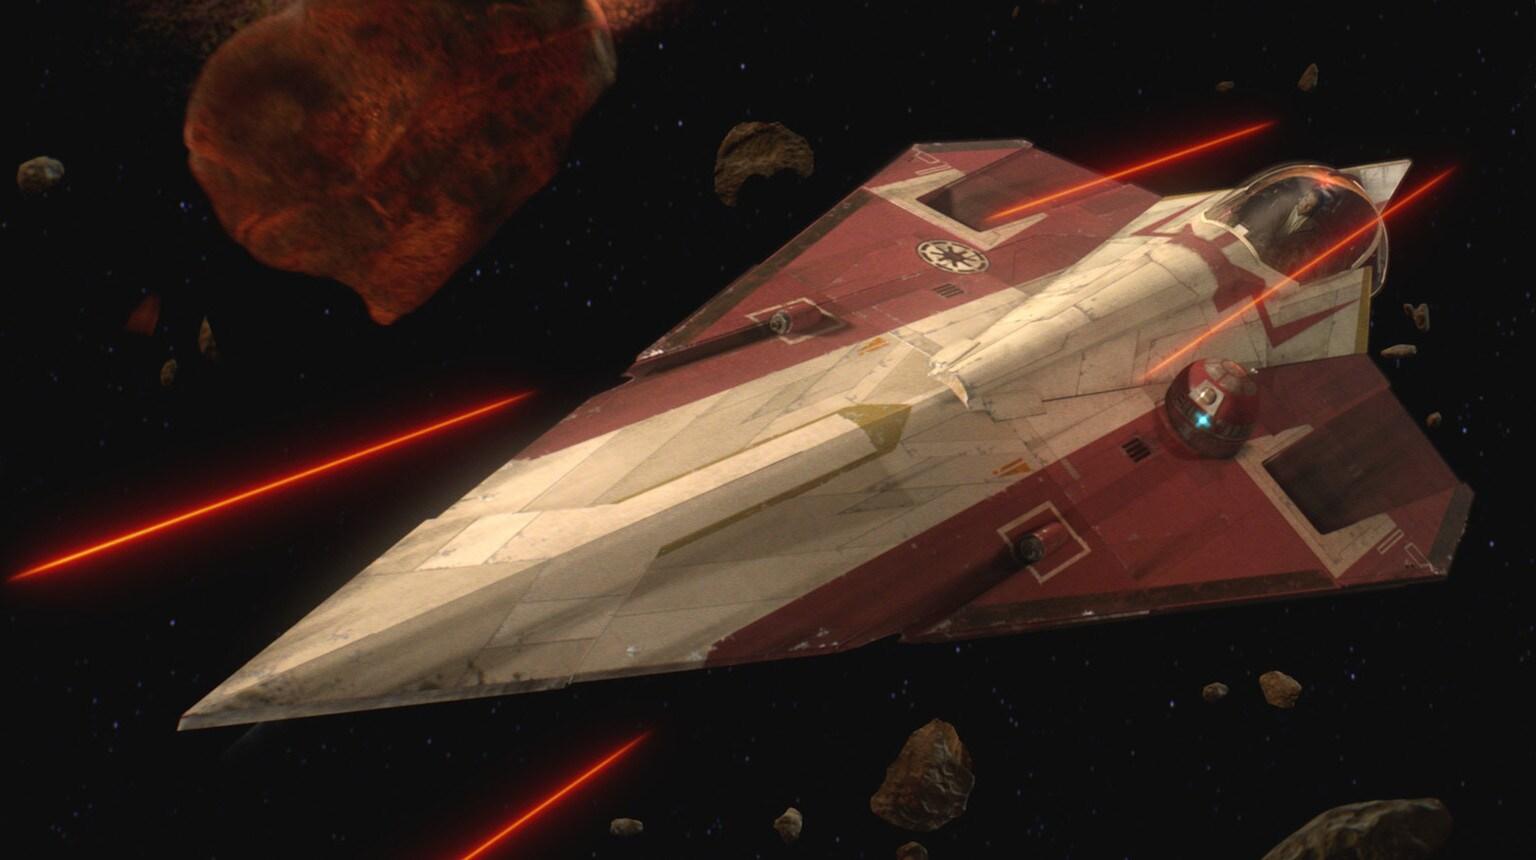 Delta-7 Jedi Starfighter